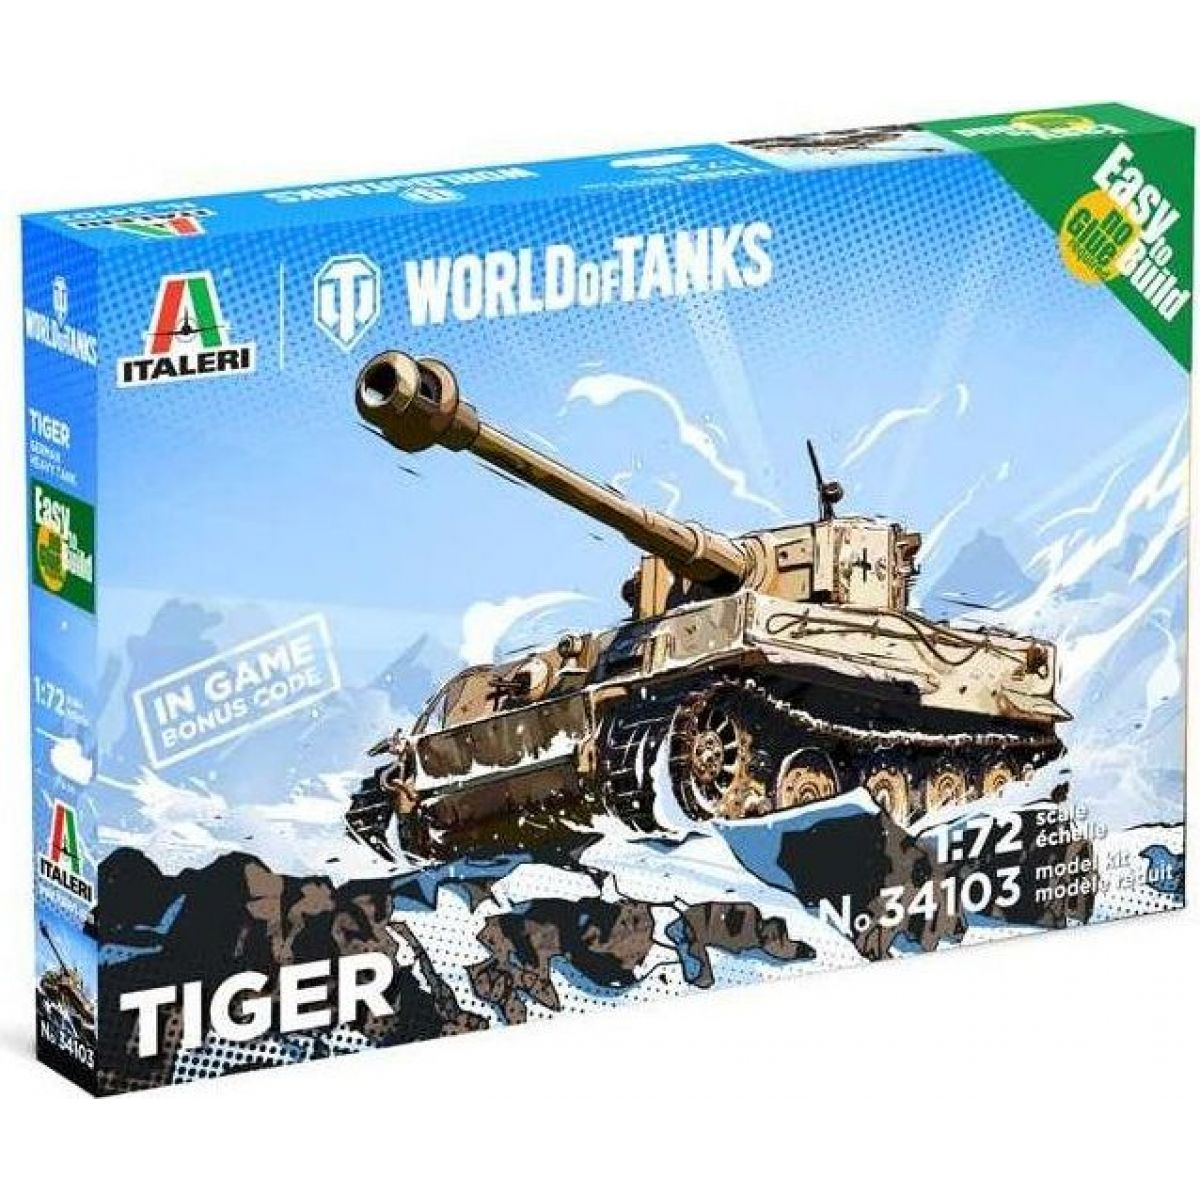 Italeri Easy to Build World of Tanks 34103 Tiger 1:72